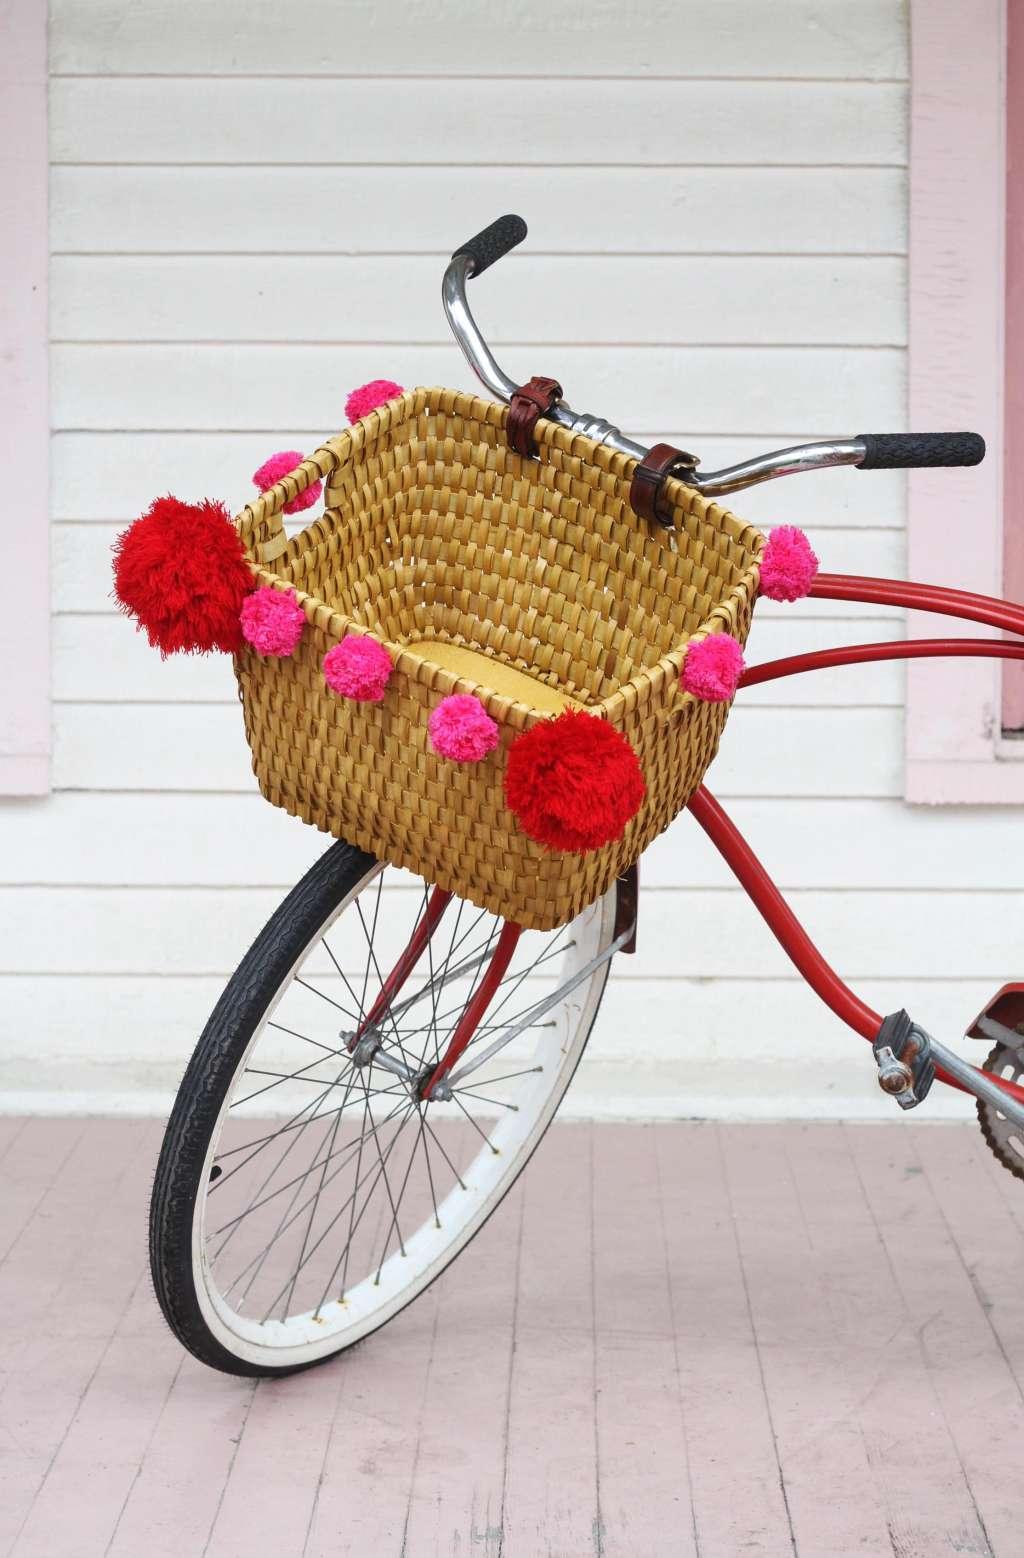 100+ DIY Project Ideas & Activities for Memorial Day Weekend